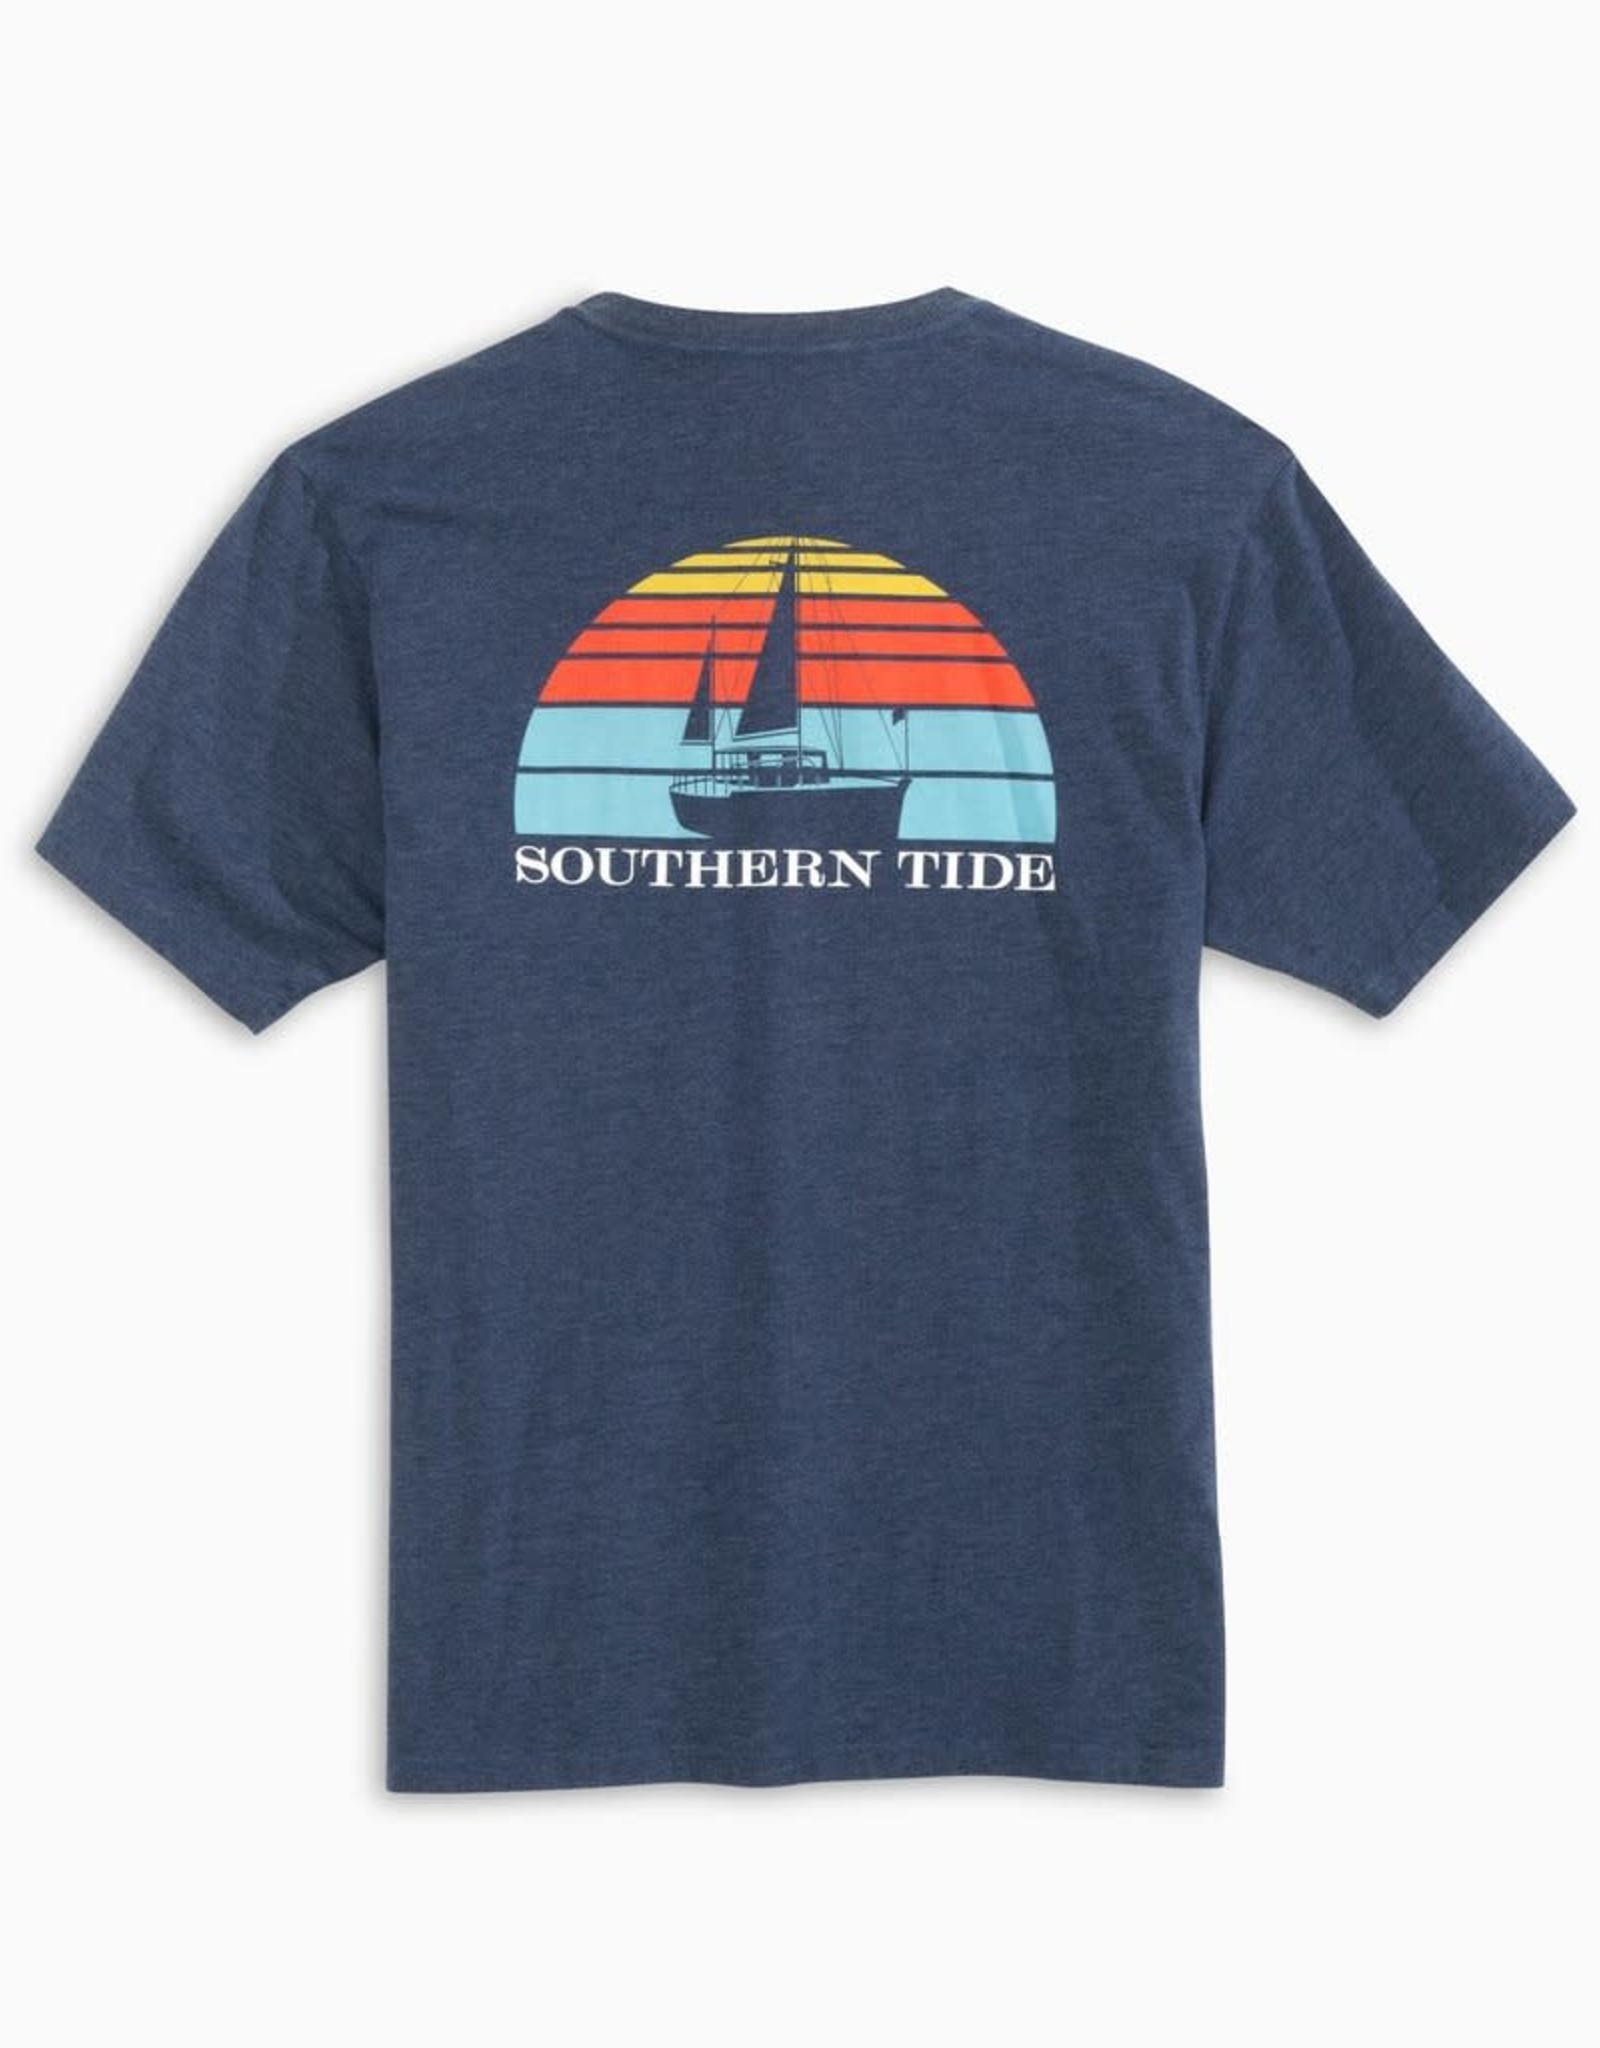 Southern Tide Southern Tide | SUNSET SAILING T-SHIRT